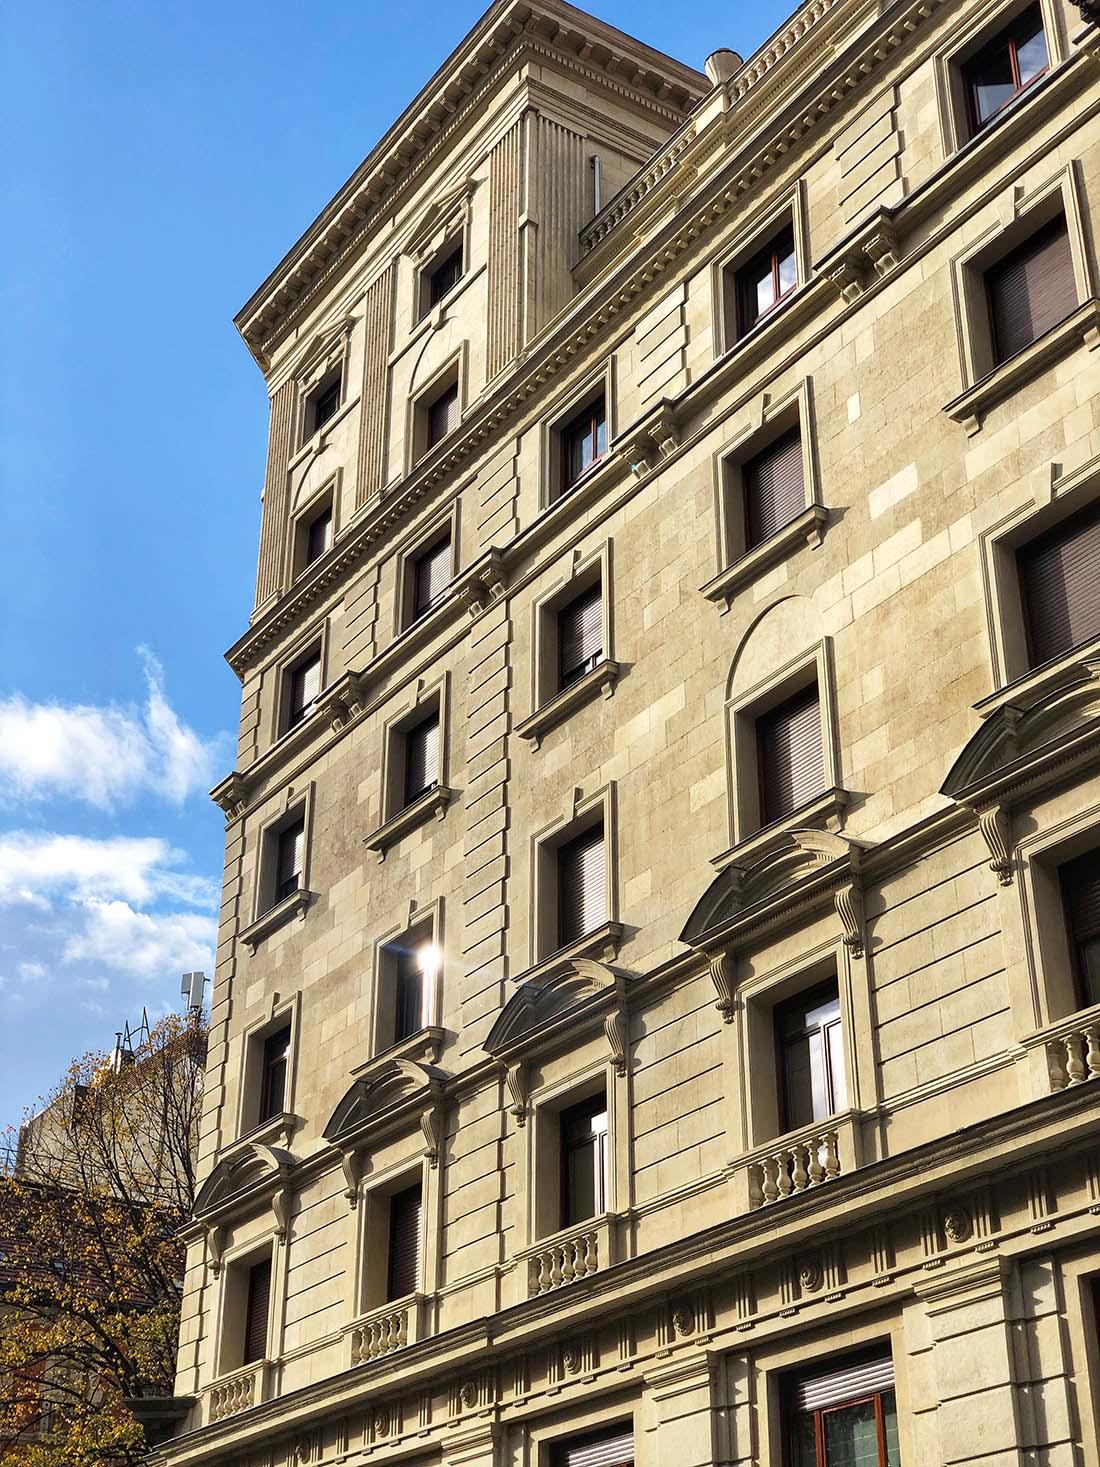 Rehabilitacion de fachada en Gran via 36 de Bilbao 3